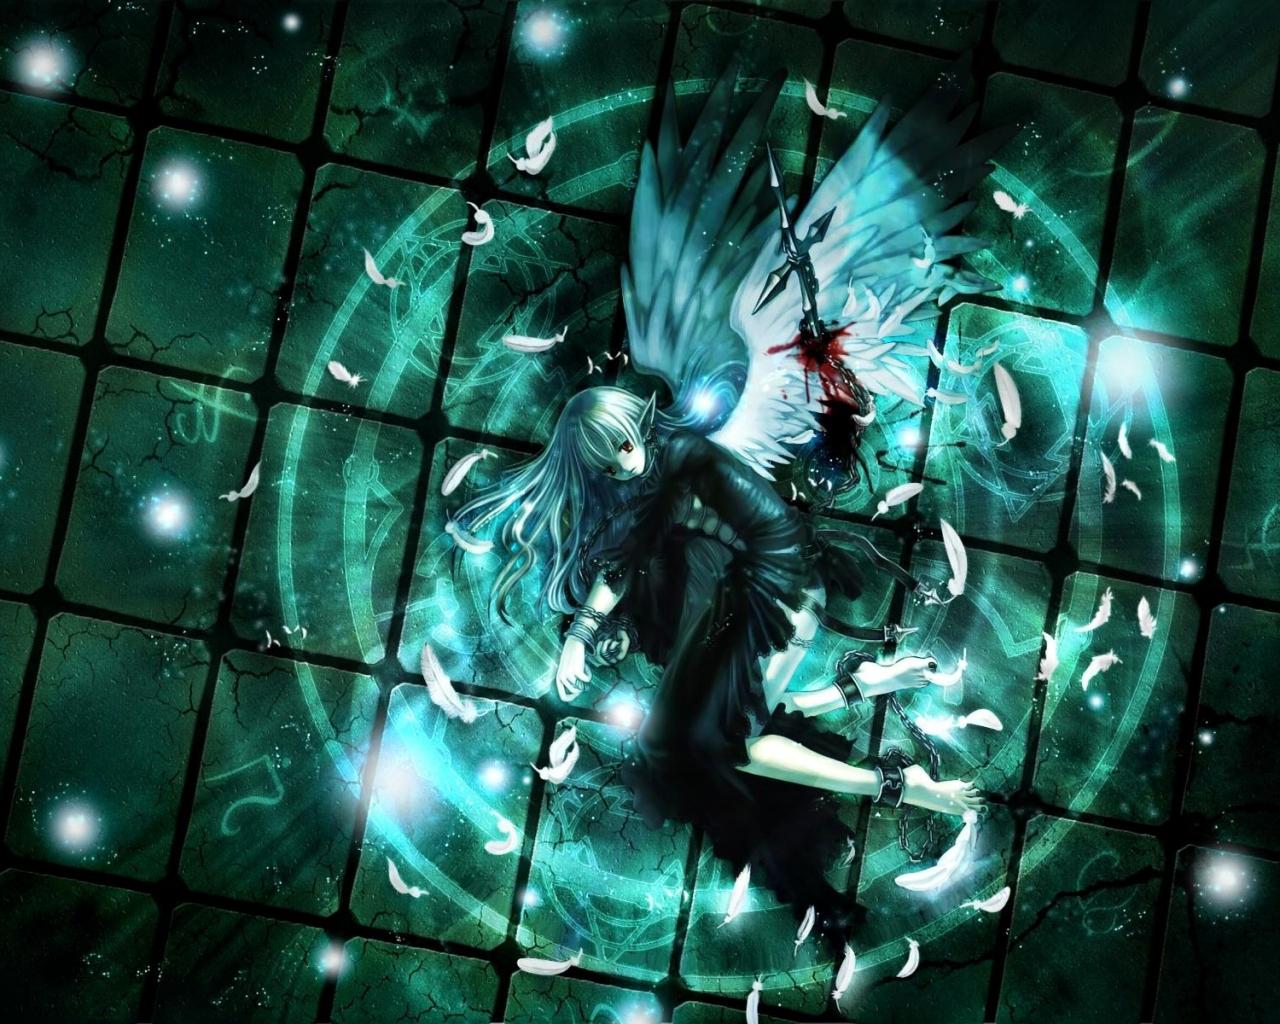 Anime wallpaper naruto 1280x1024 fondo de pantalla 2014 - Www wallpaper anime ...